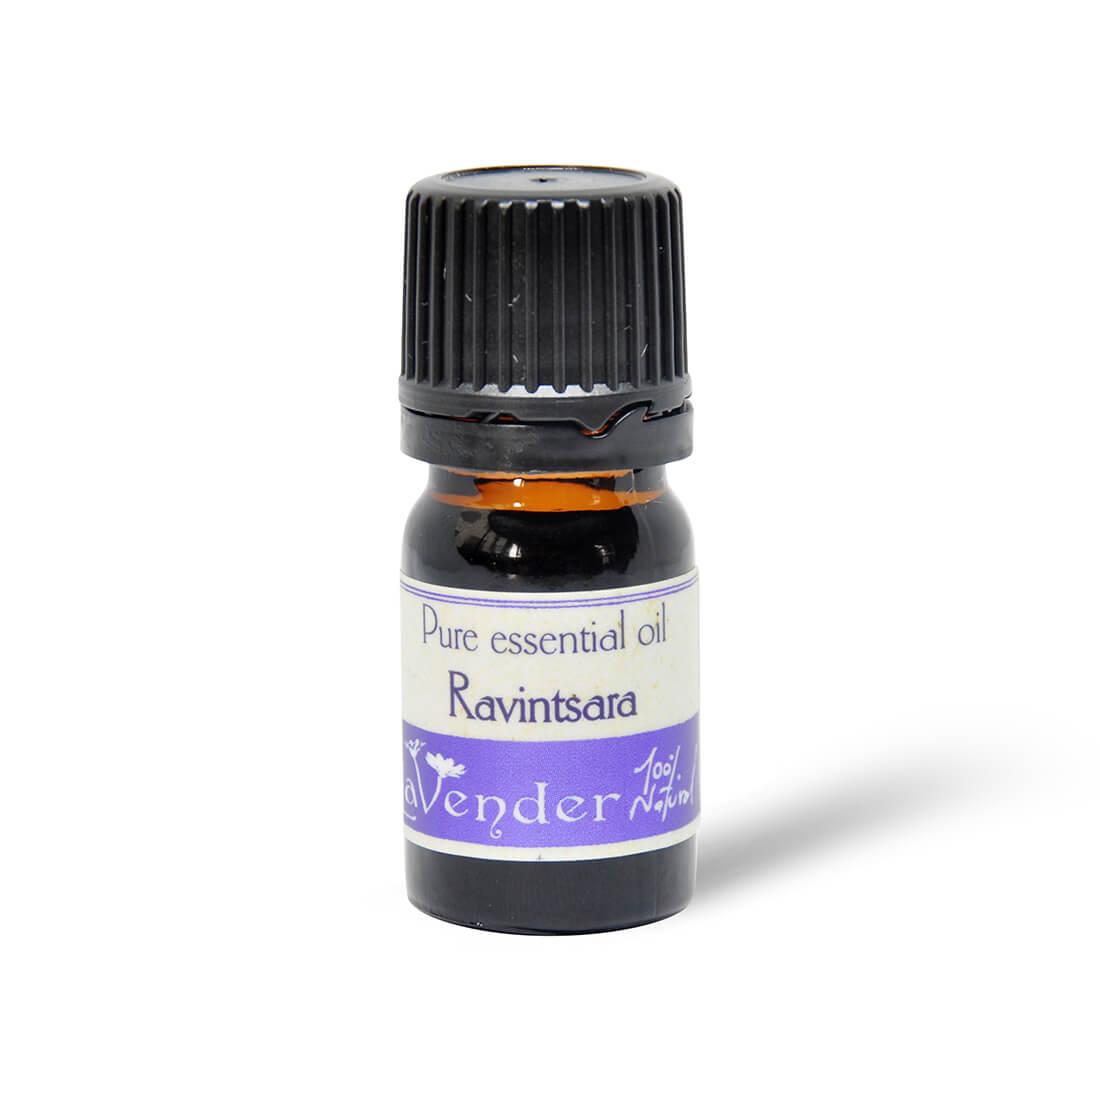 ravintsara essential oil - lavender all natural cosmetics